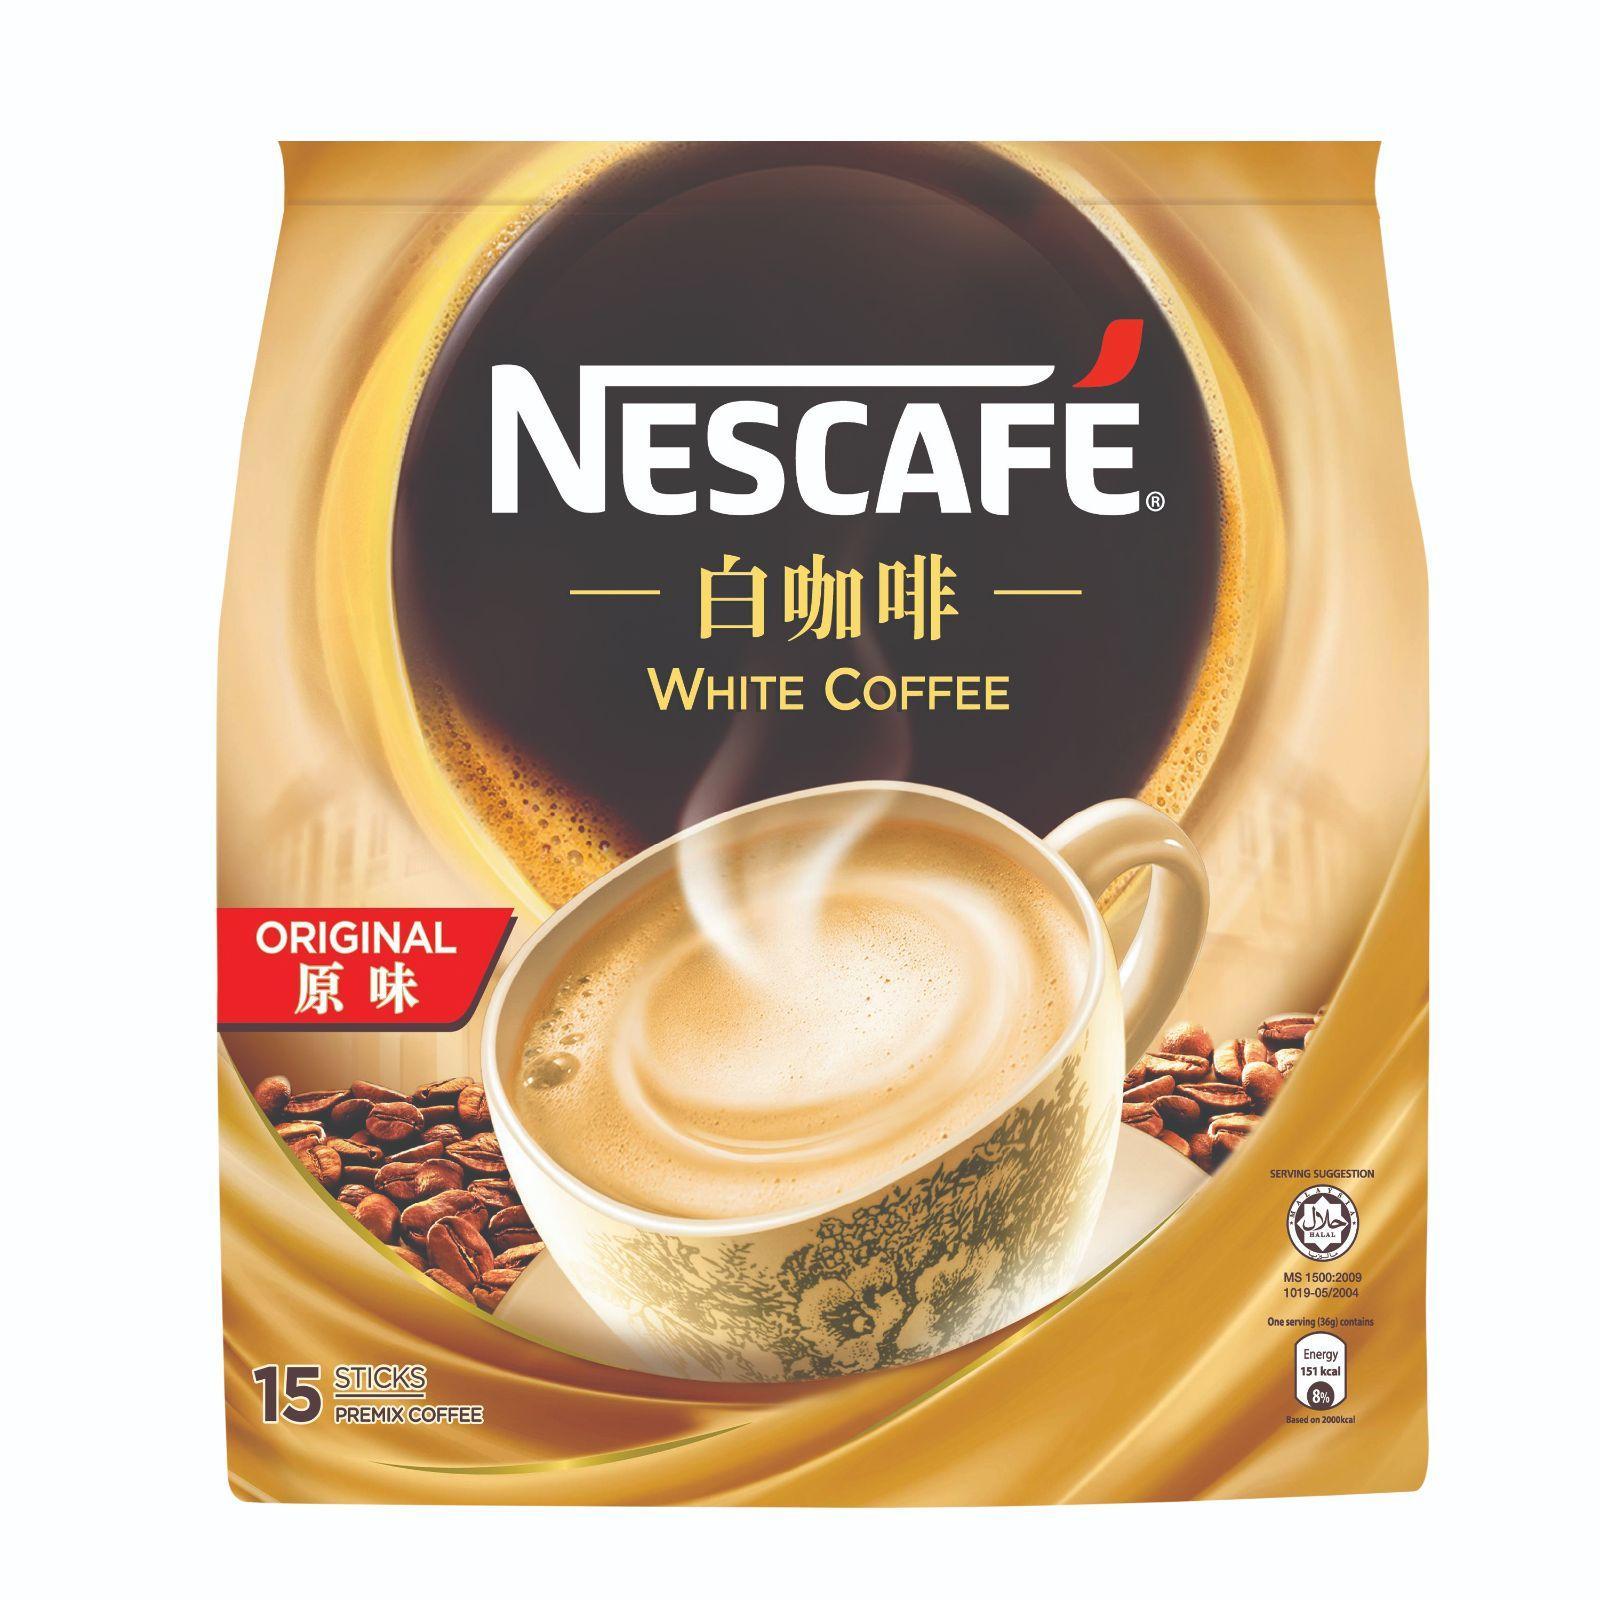 Nescafe Instant White Coffee - Original